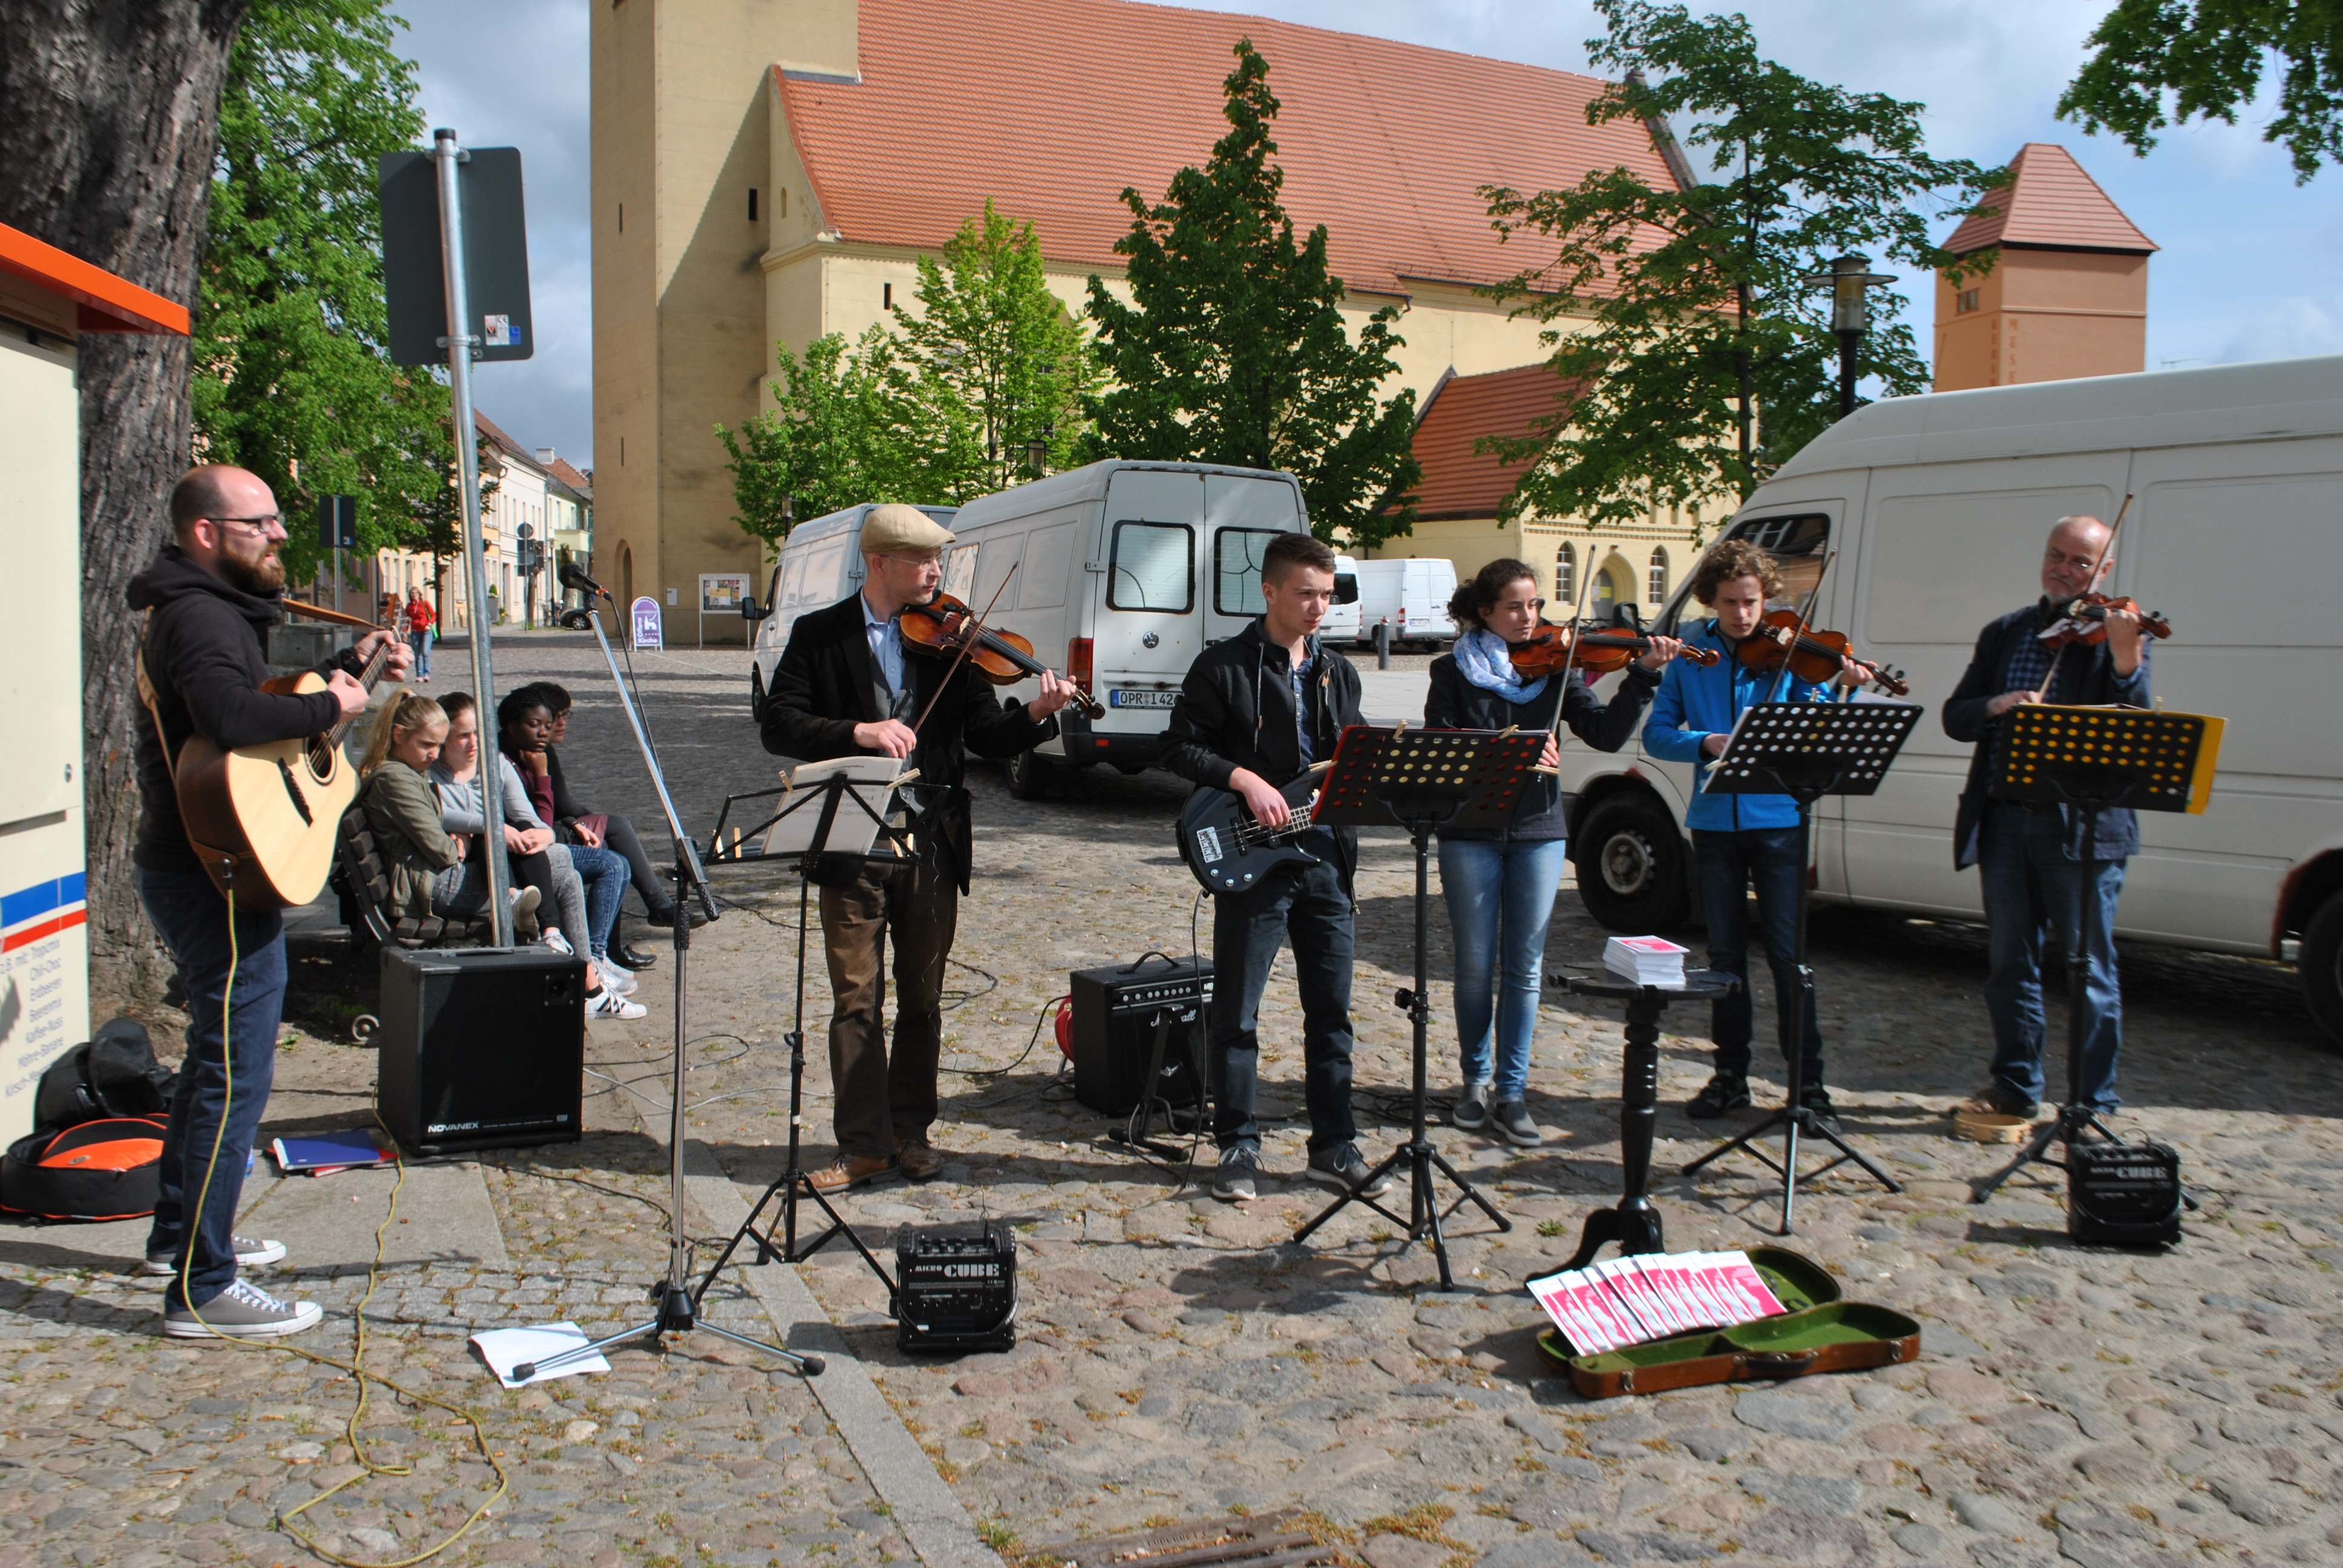 Straßenmusik in Rheinsberg